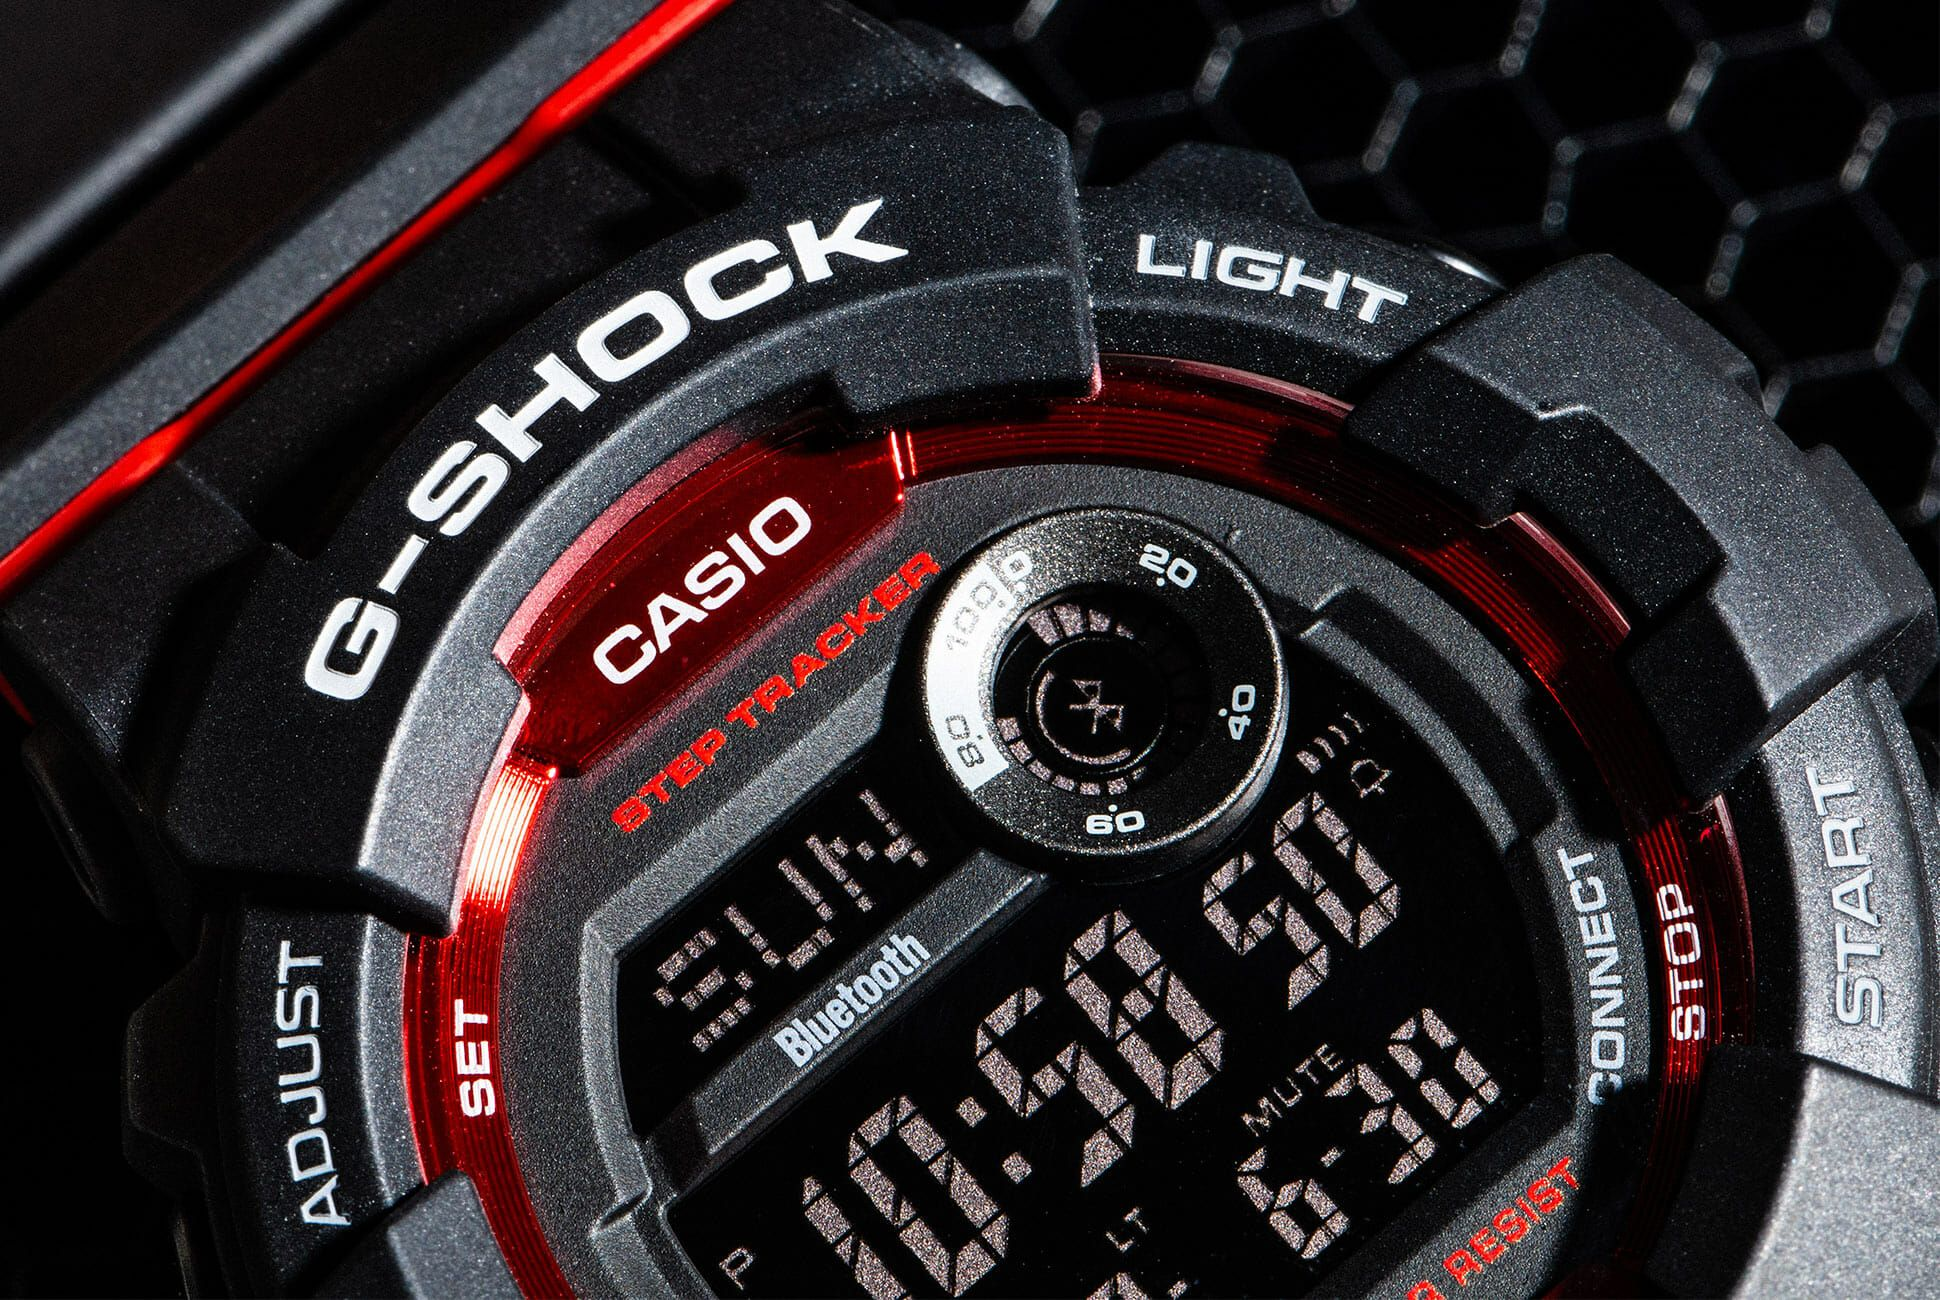 Sponsored-Casio-G-Shock-GBD800-gear-patrol-slide-5